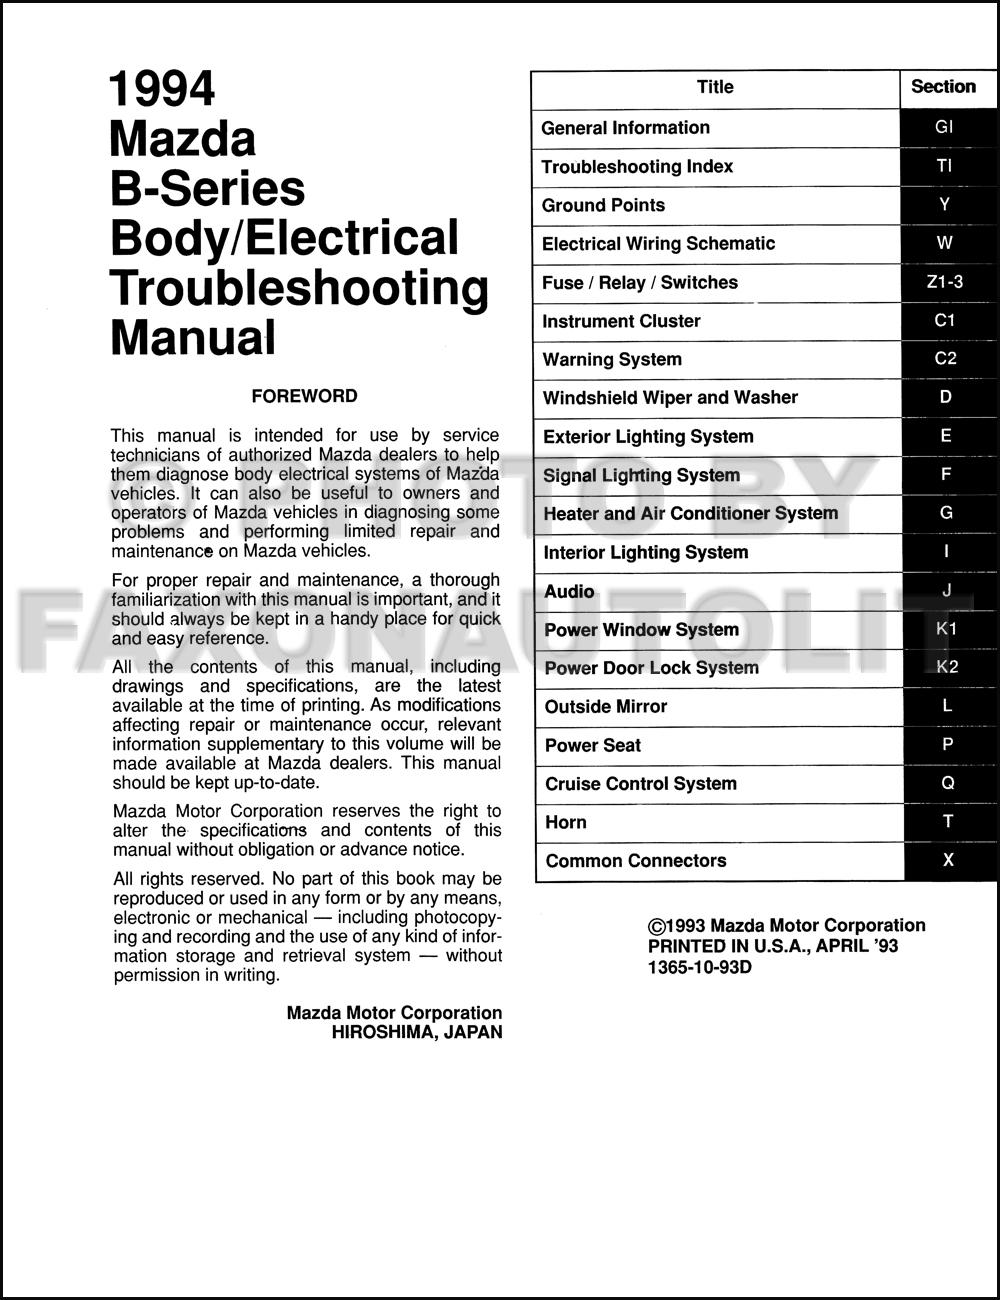 1996 Mazda Pickup Truck Body Electrical Troubleshooting